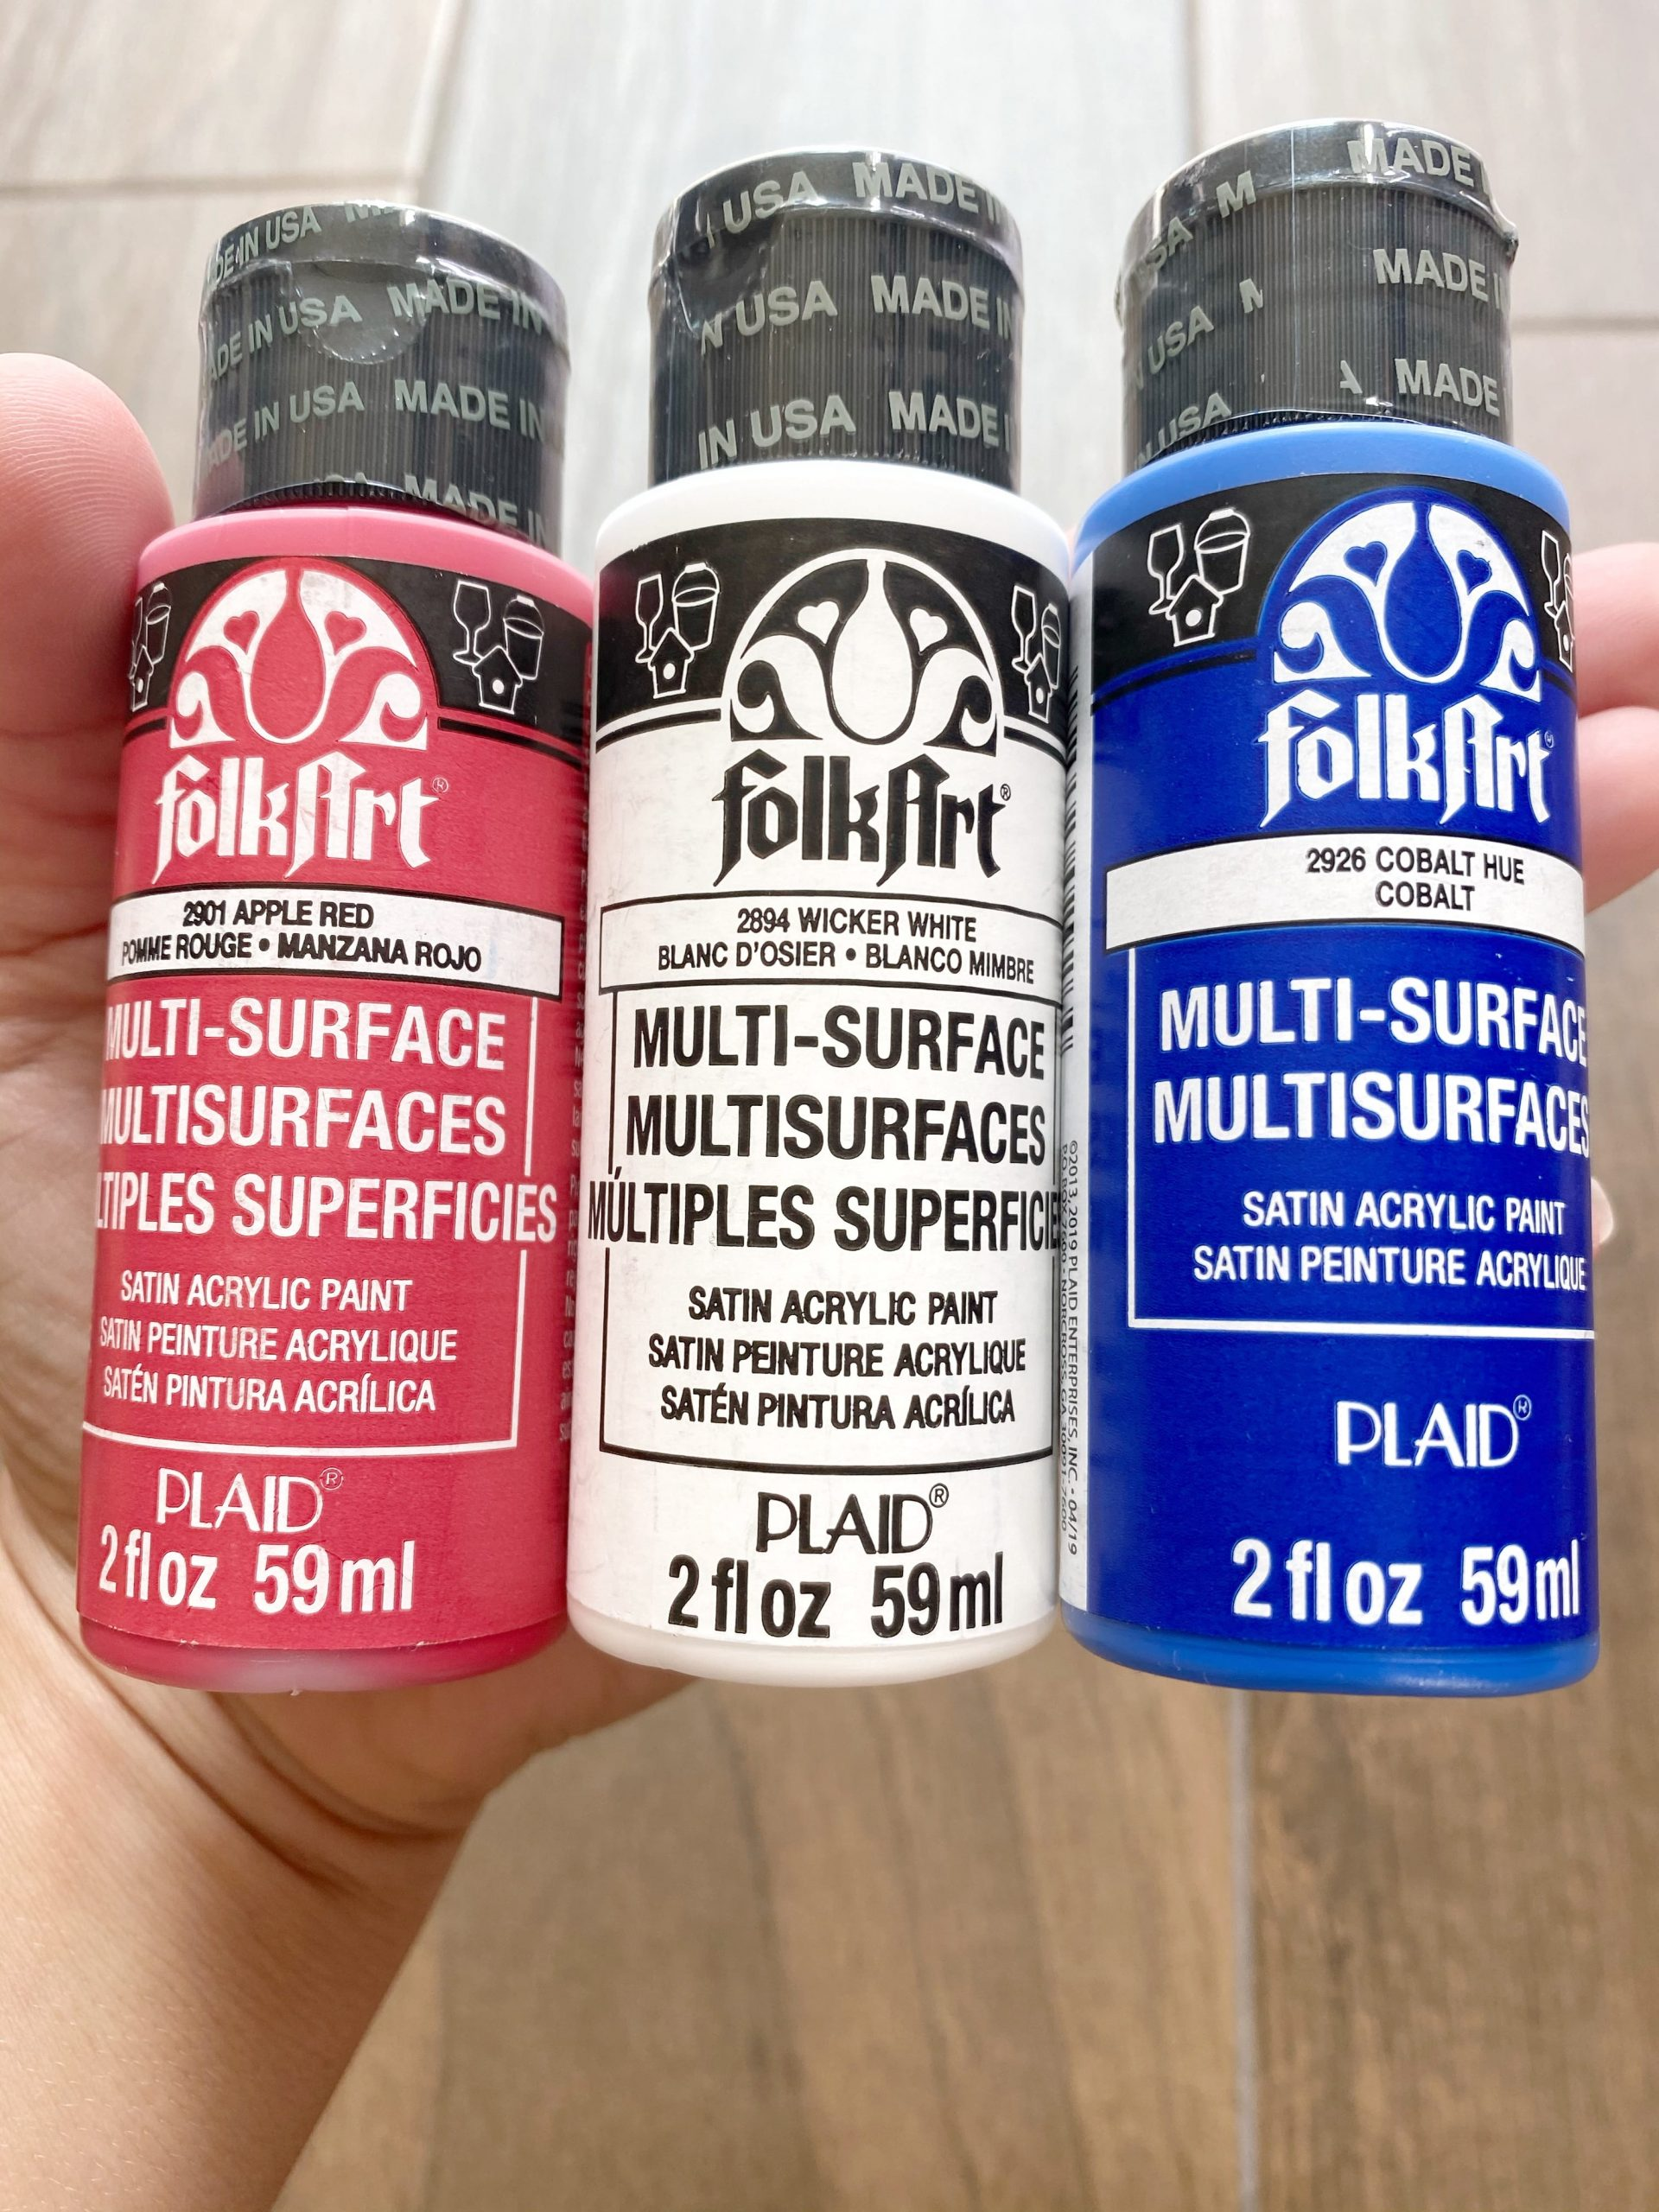 FolkArt Multi-Surface paint